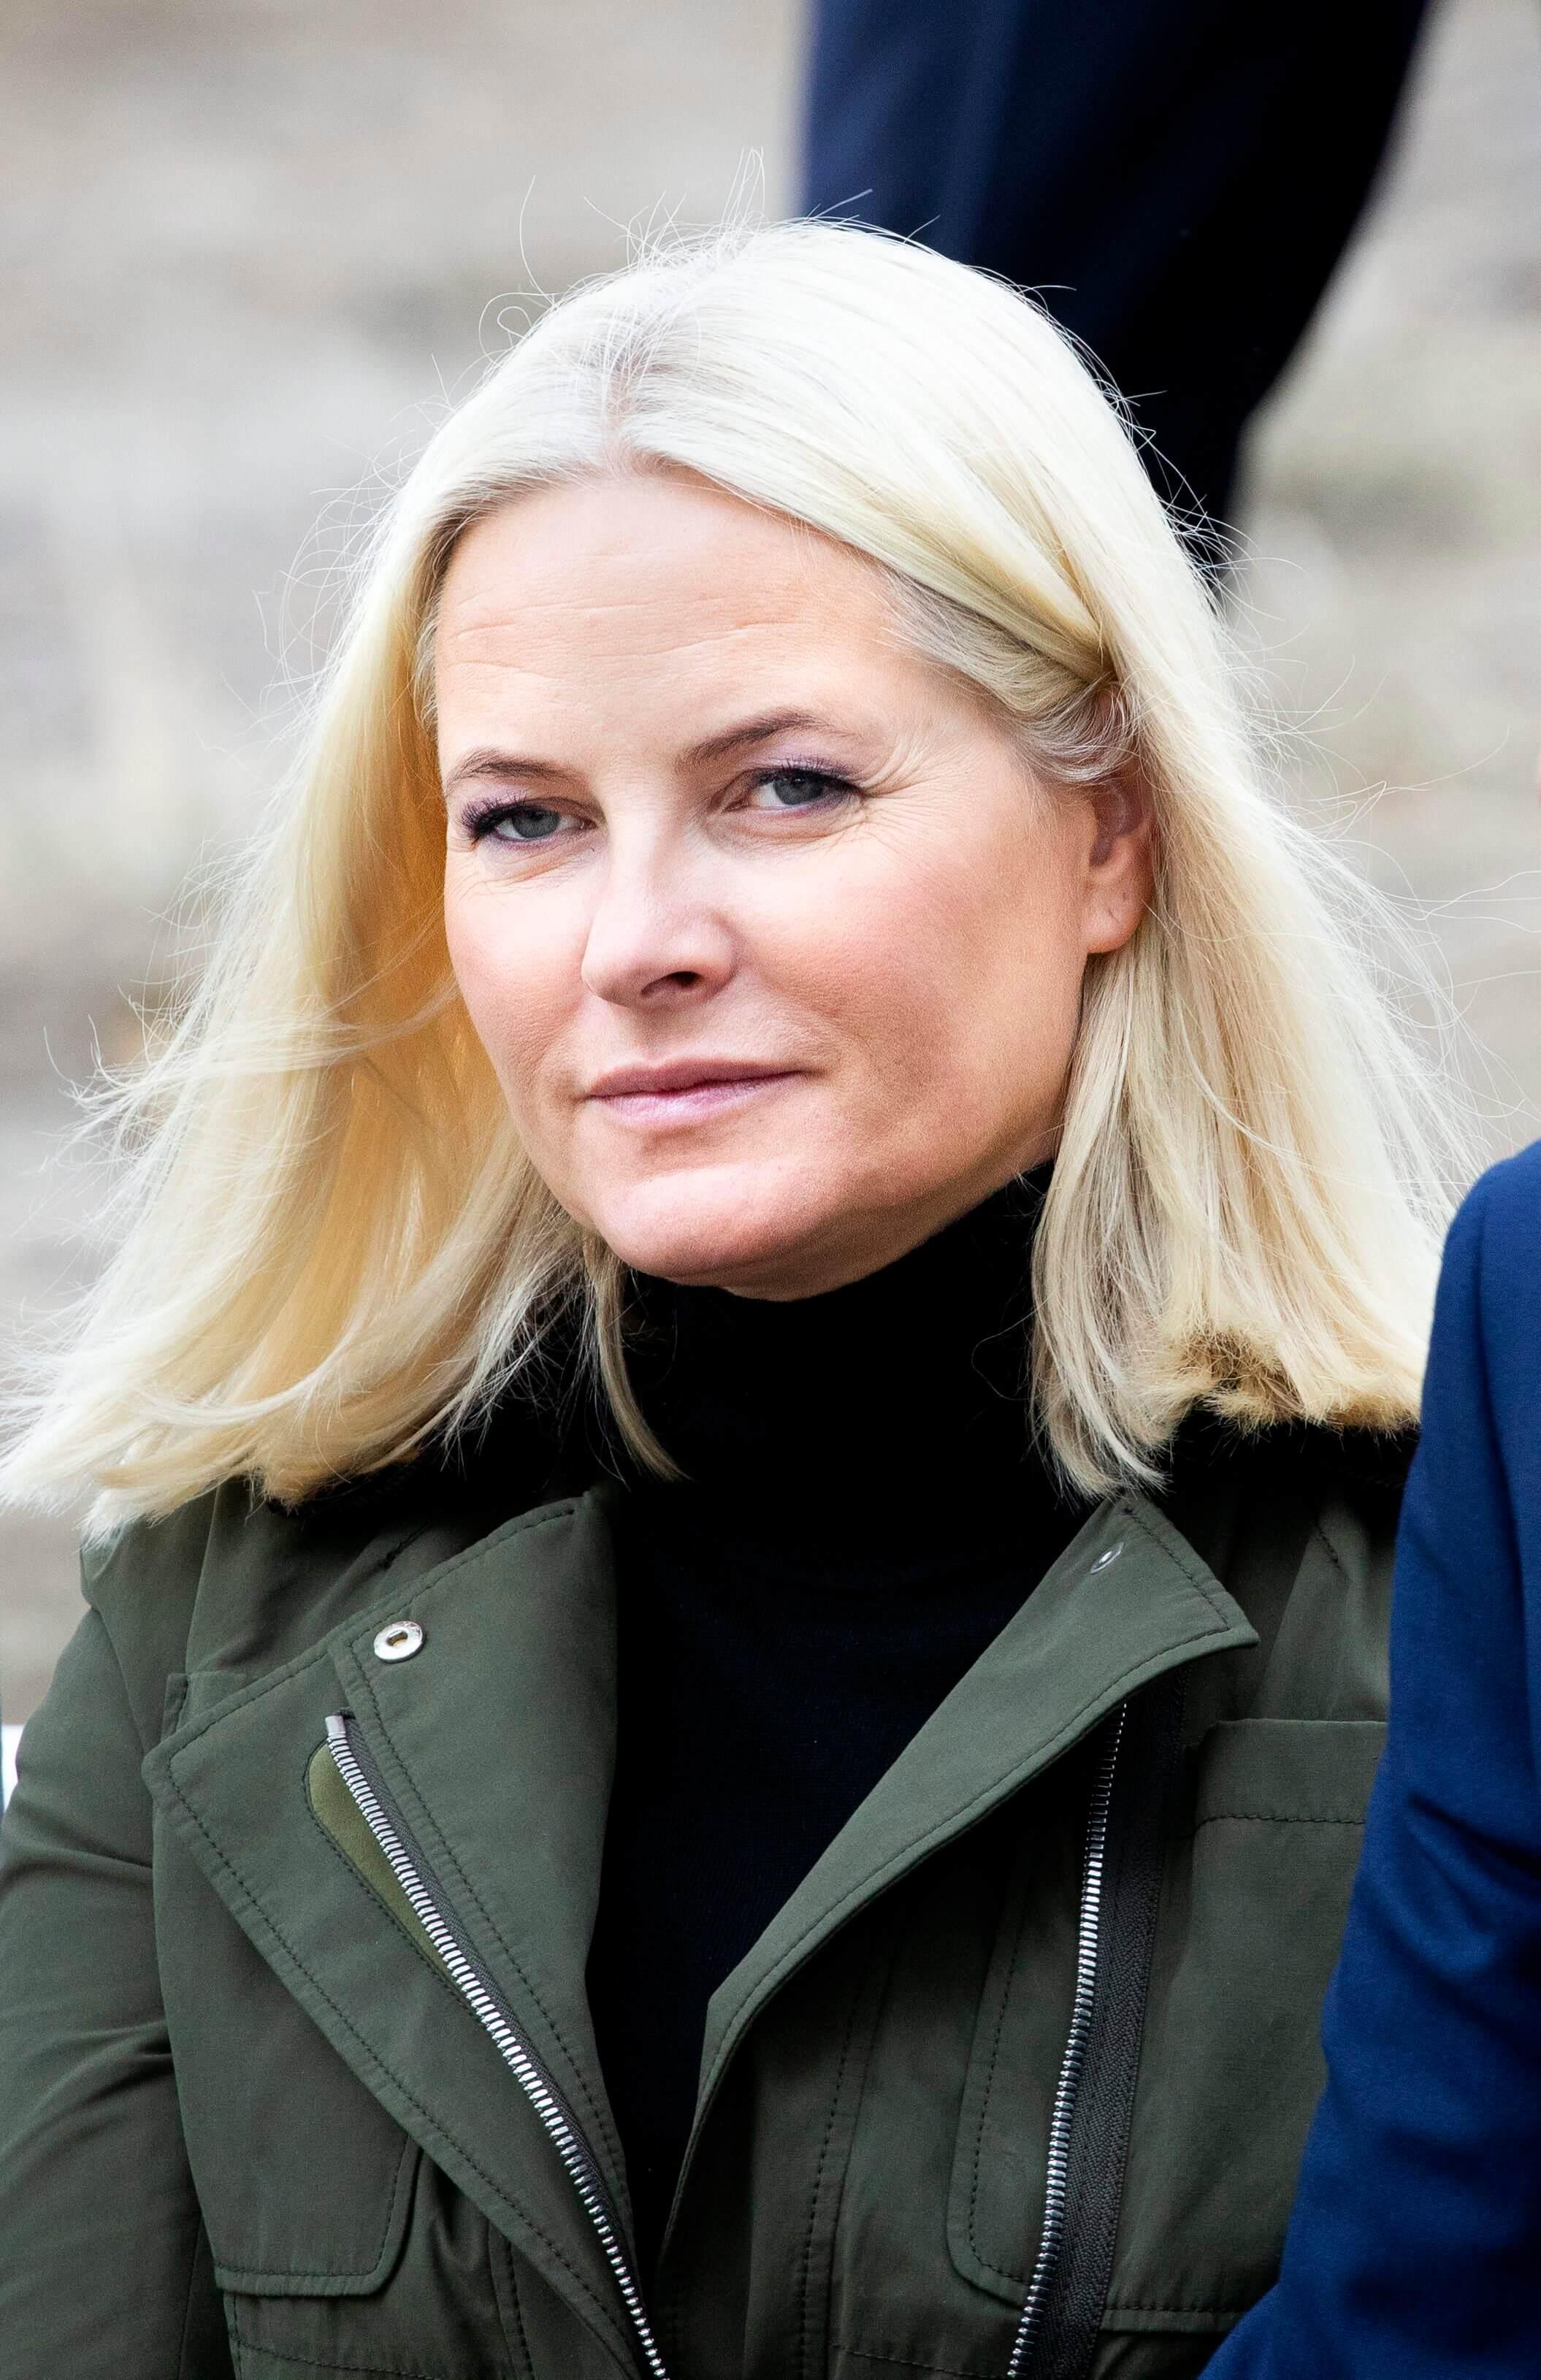 Mette-Marit von Norwegen